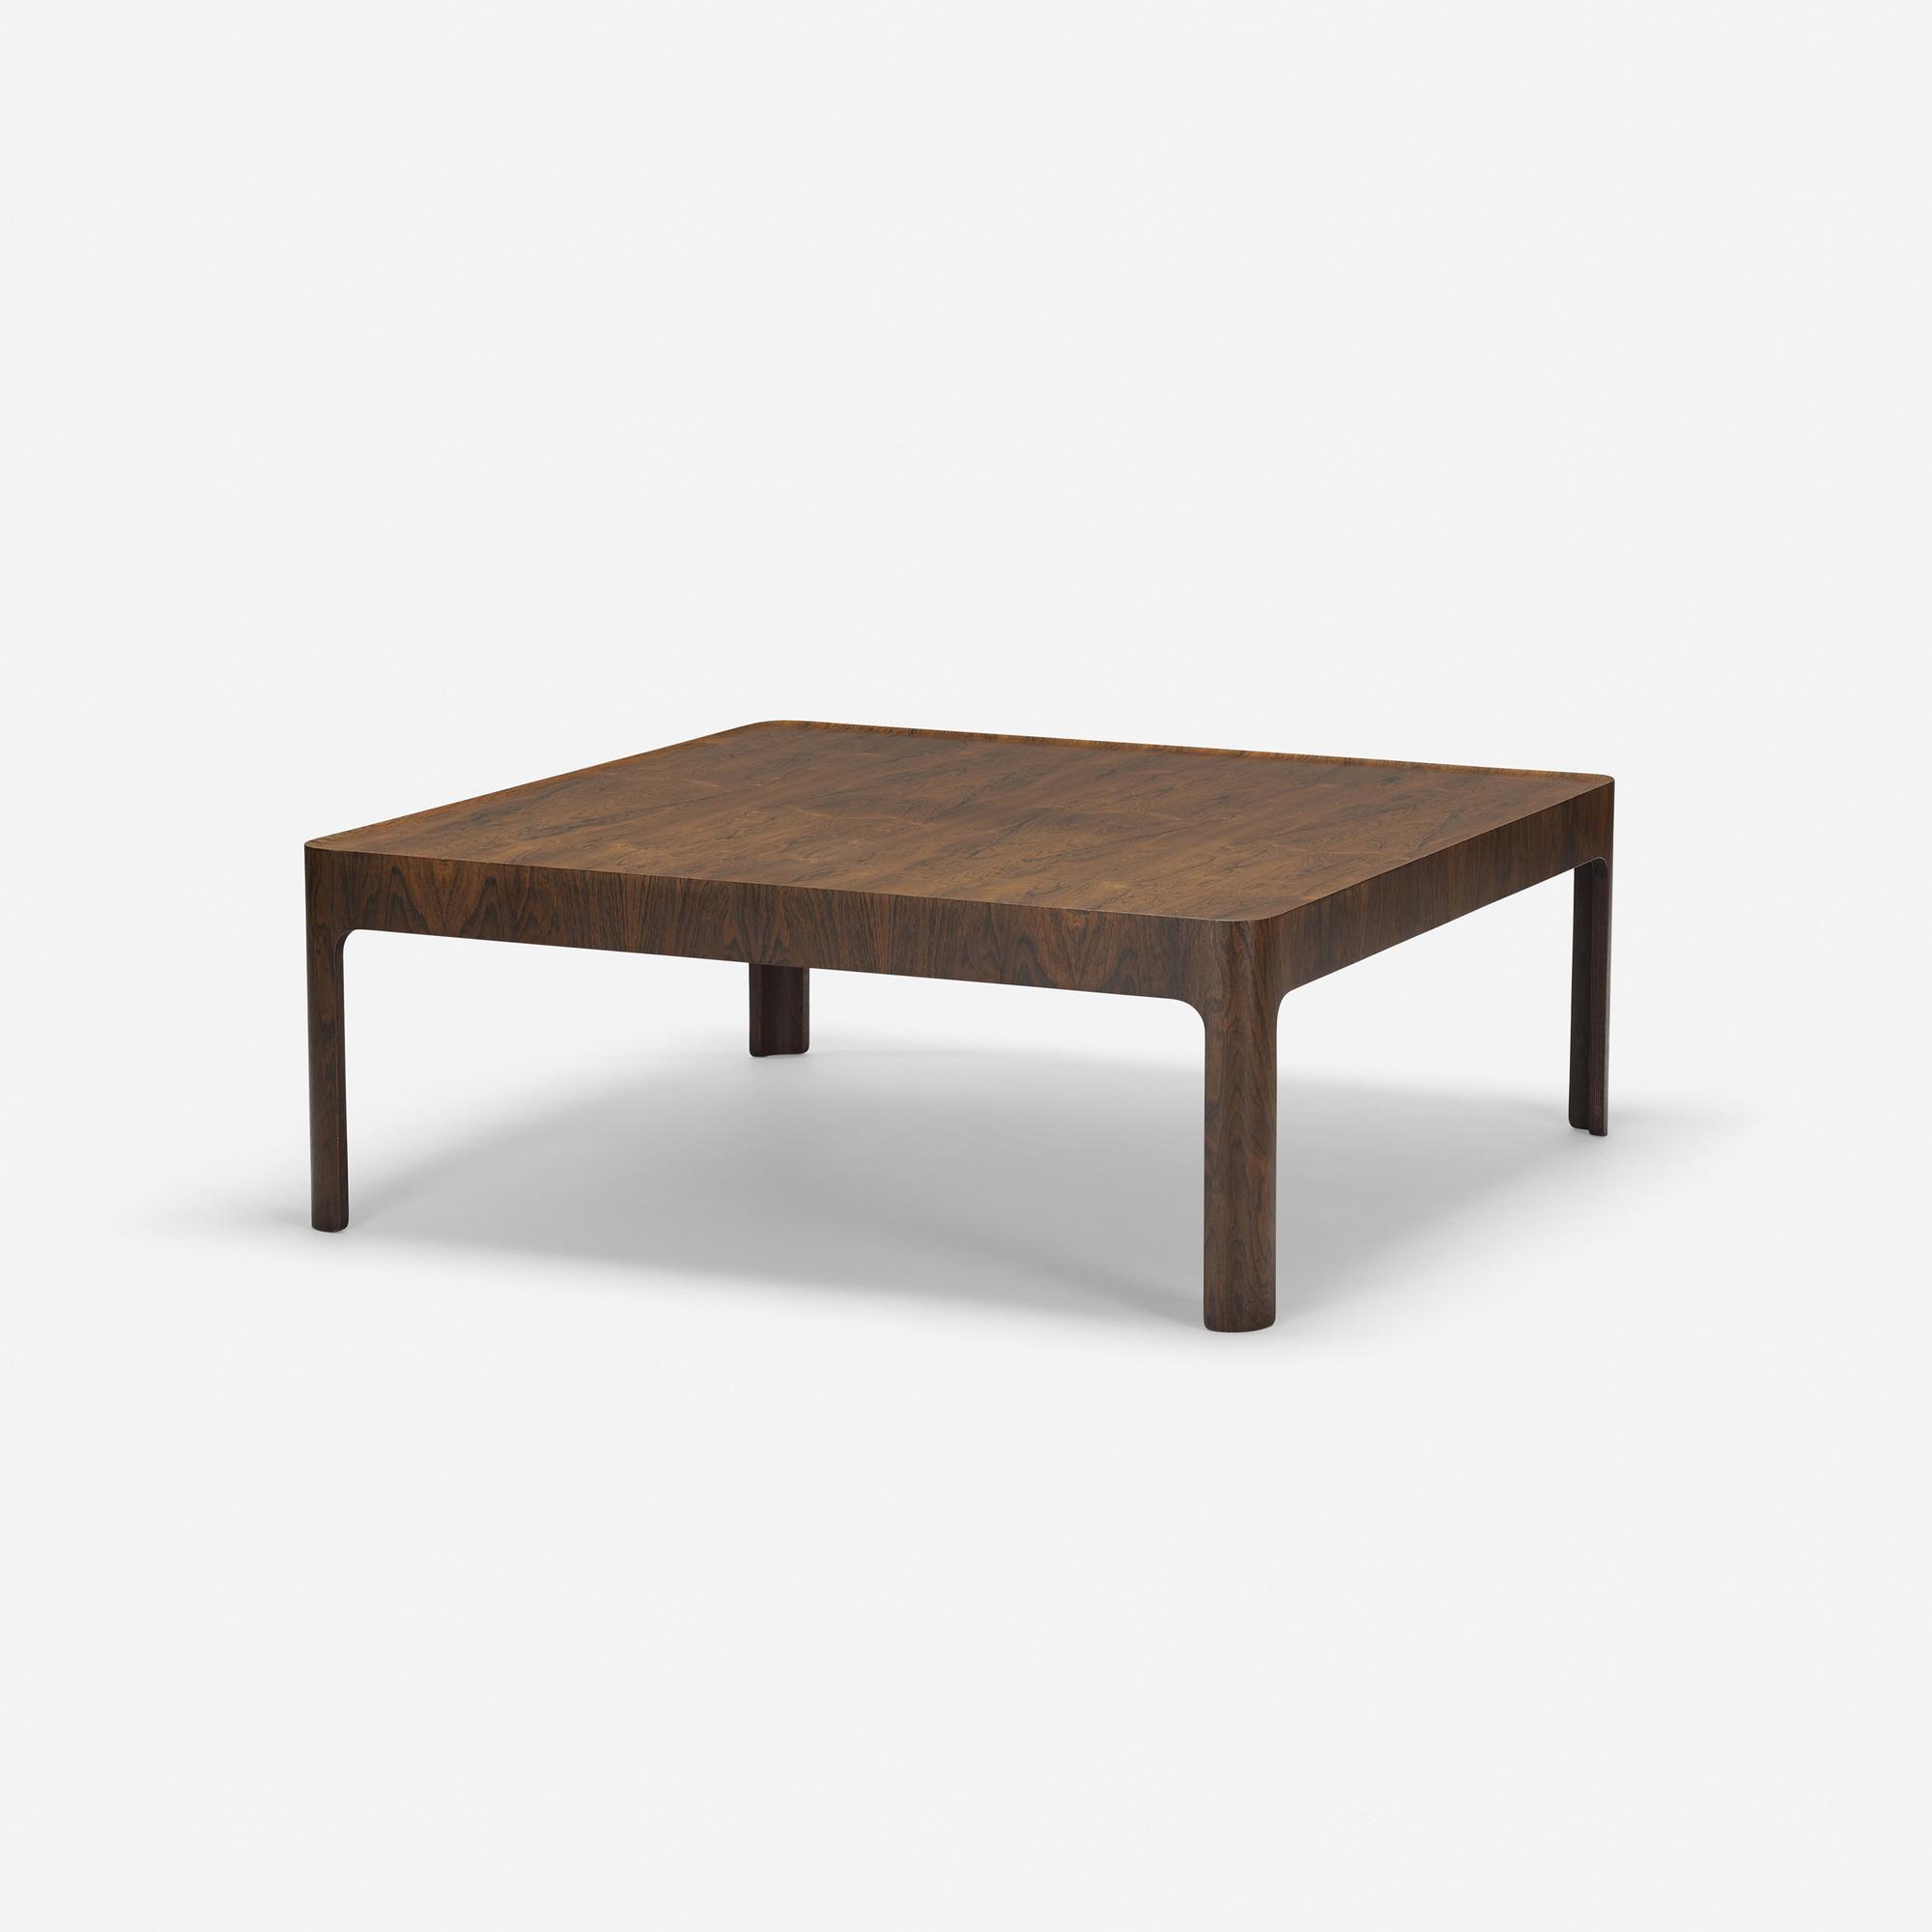 295: Isamu Kenmochi / Coffee Table (1 Of 3)